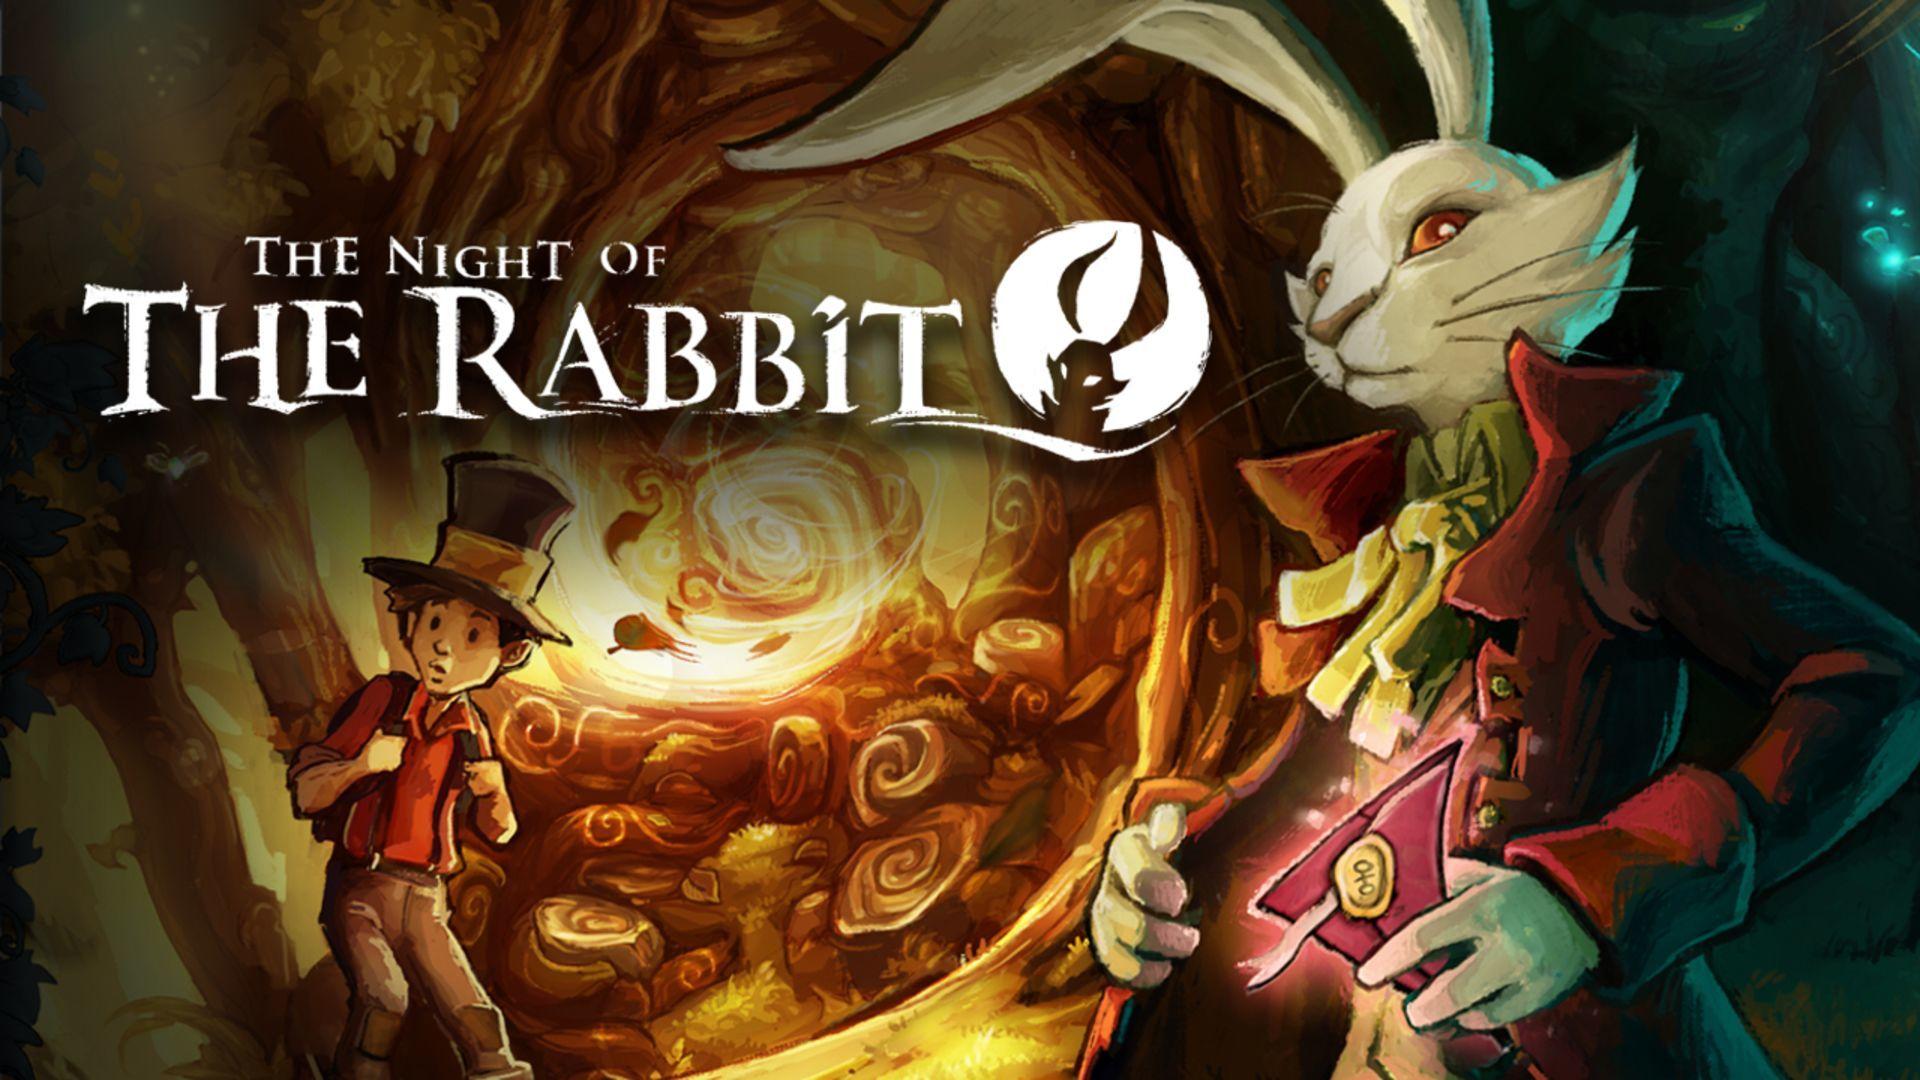 Requisitos para instalar The Night of the Rabbit